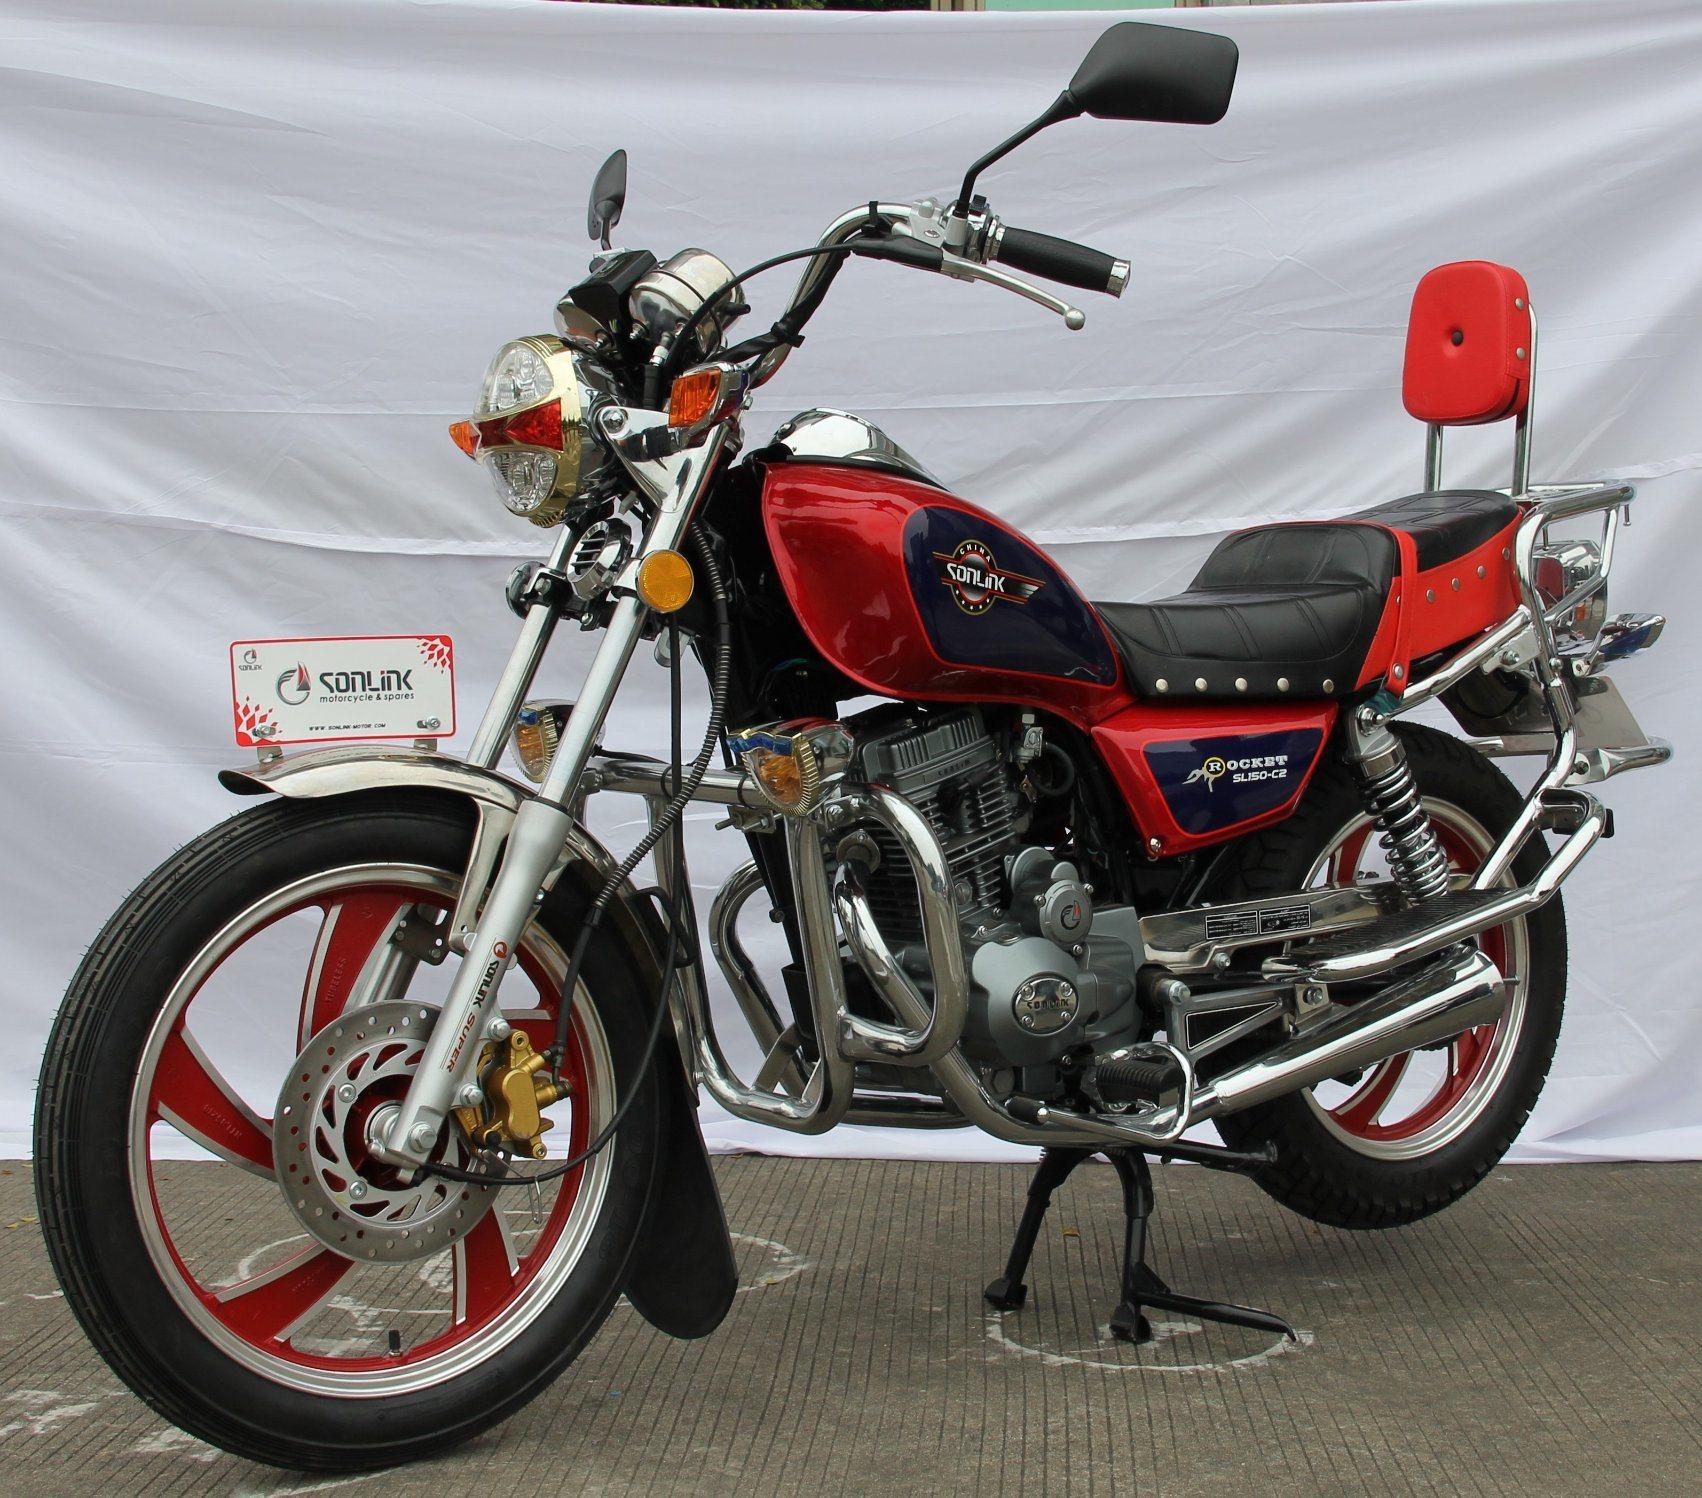 110cc/125cc/150cc Gas EEC Gn125 Honda Type on/off Road Motorbike/Motorcycle (SL125-C2)